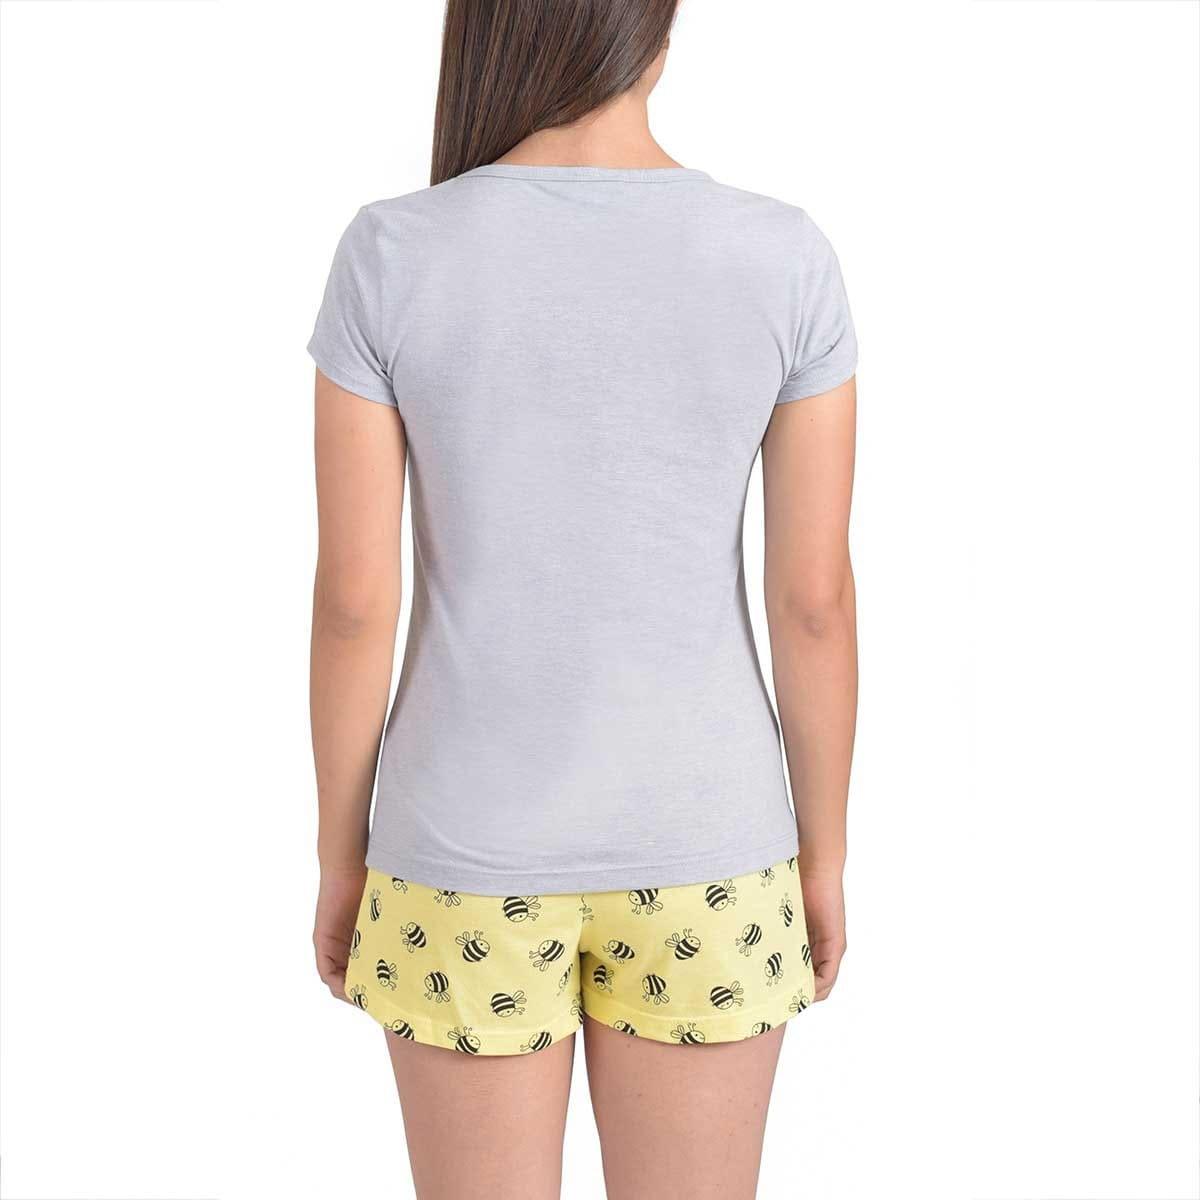 Pijama con Estampado de Abeja la Nuit